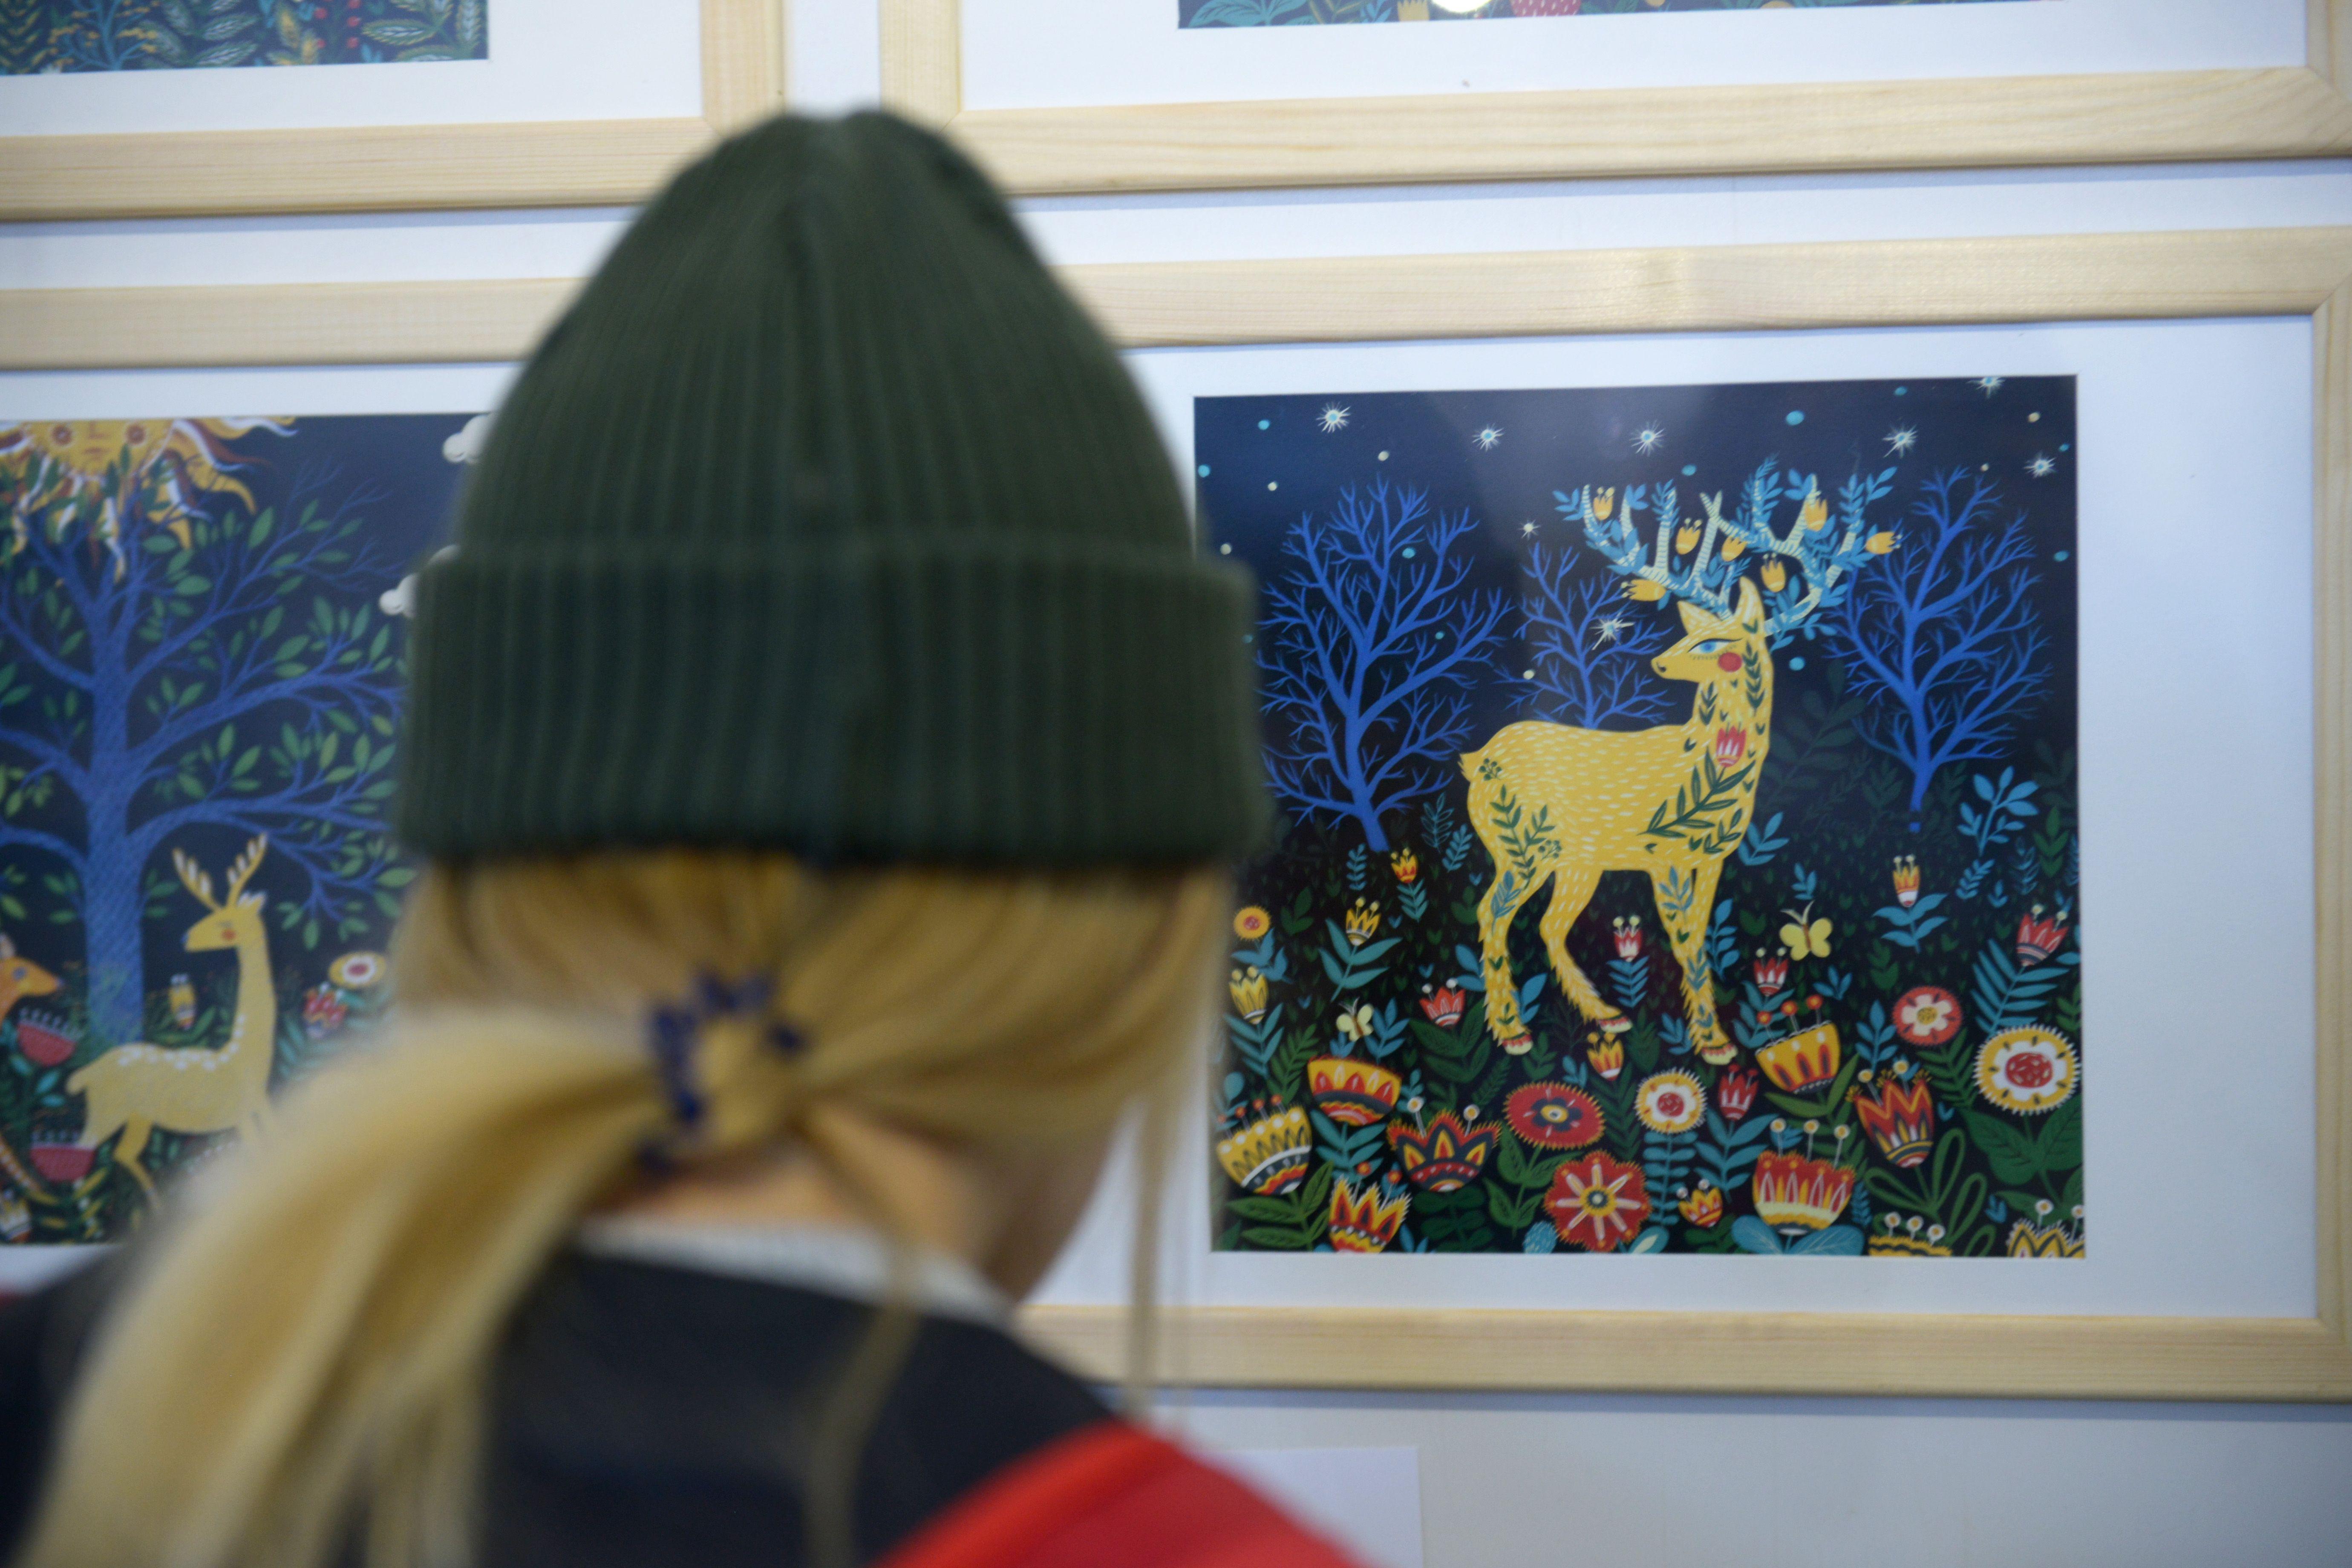 Детскую школу искусств Воскресенского представили на международном конкурсе